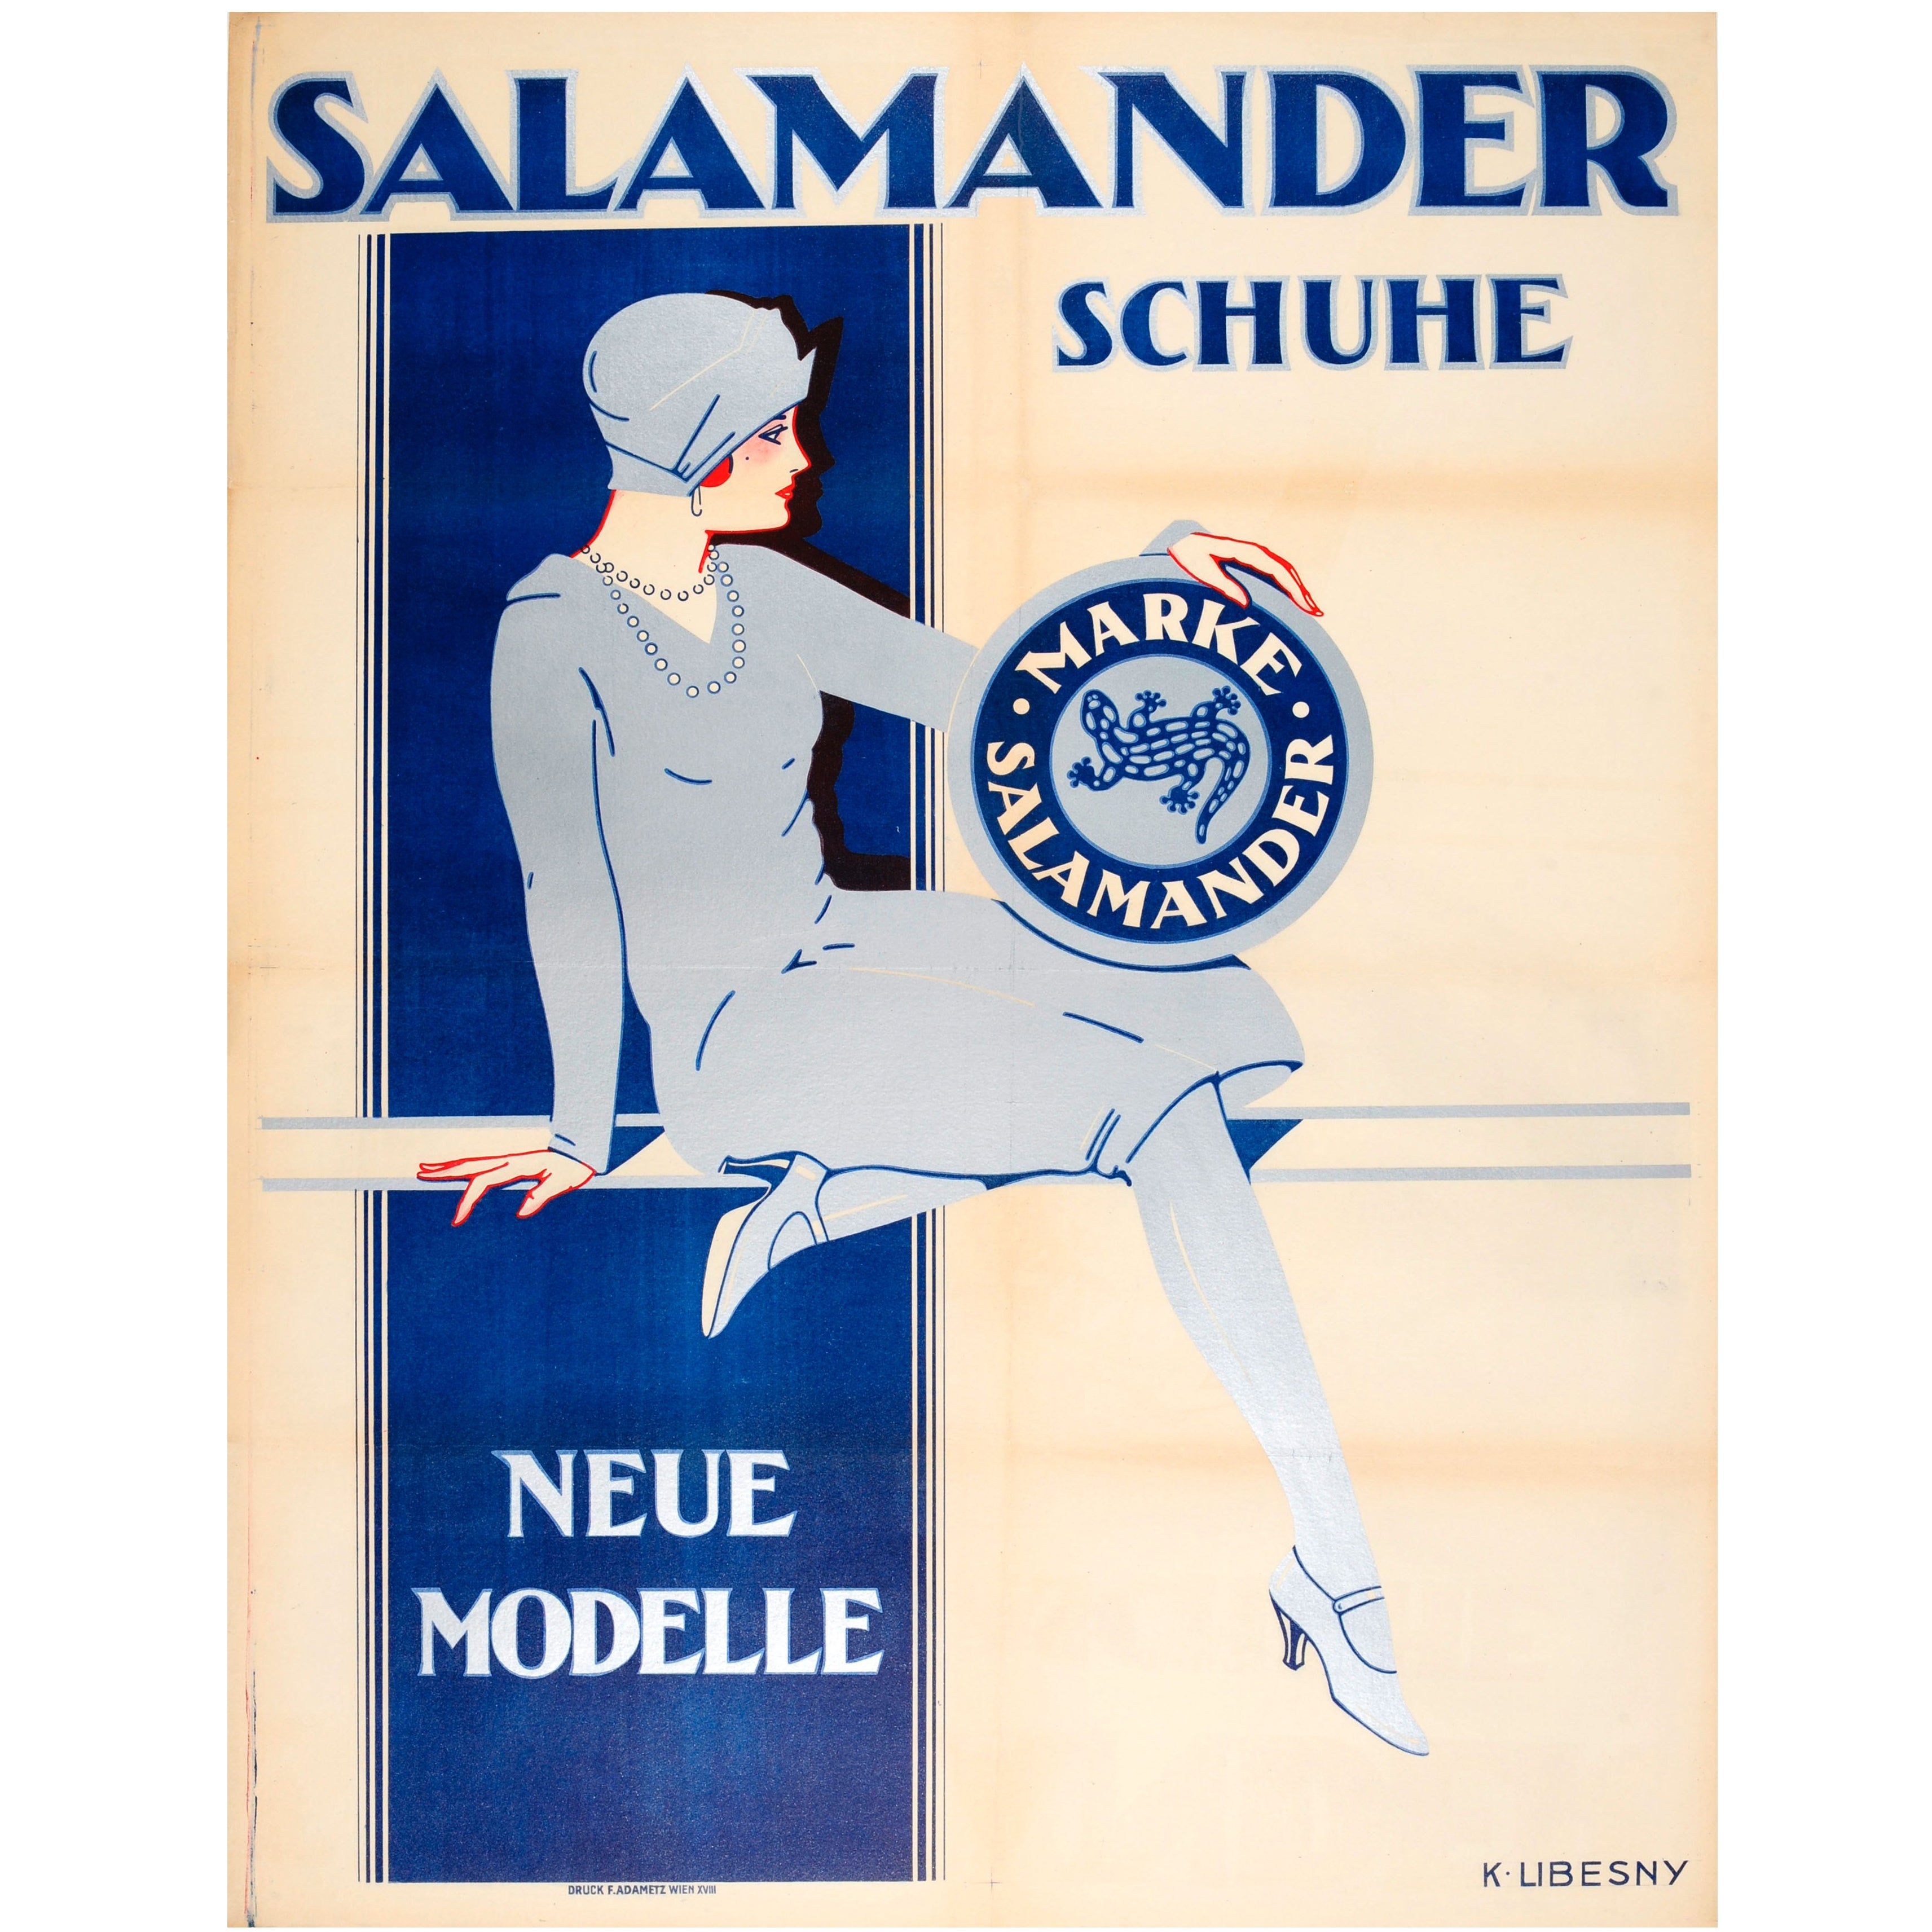 Large Original 1920s Austrian Art Deco Advertising Poster for Salamander Shoes